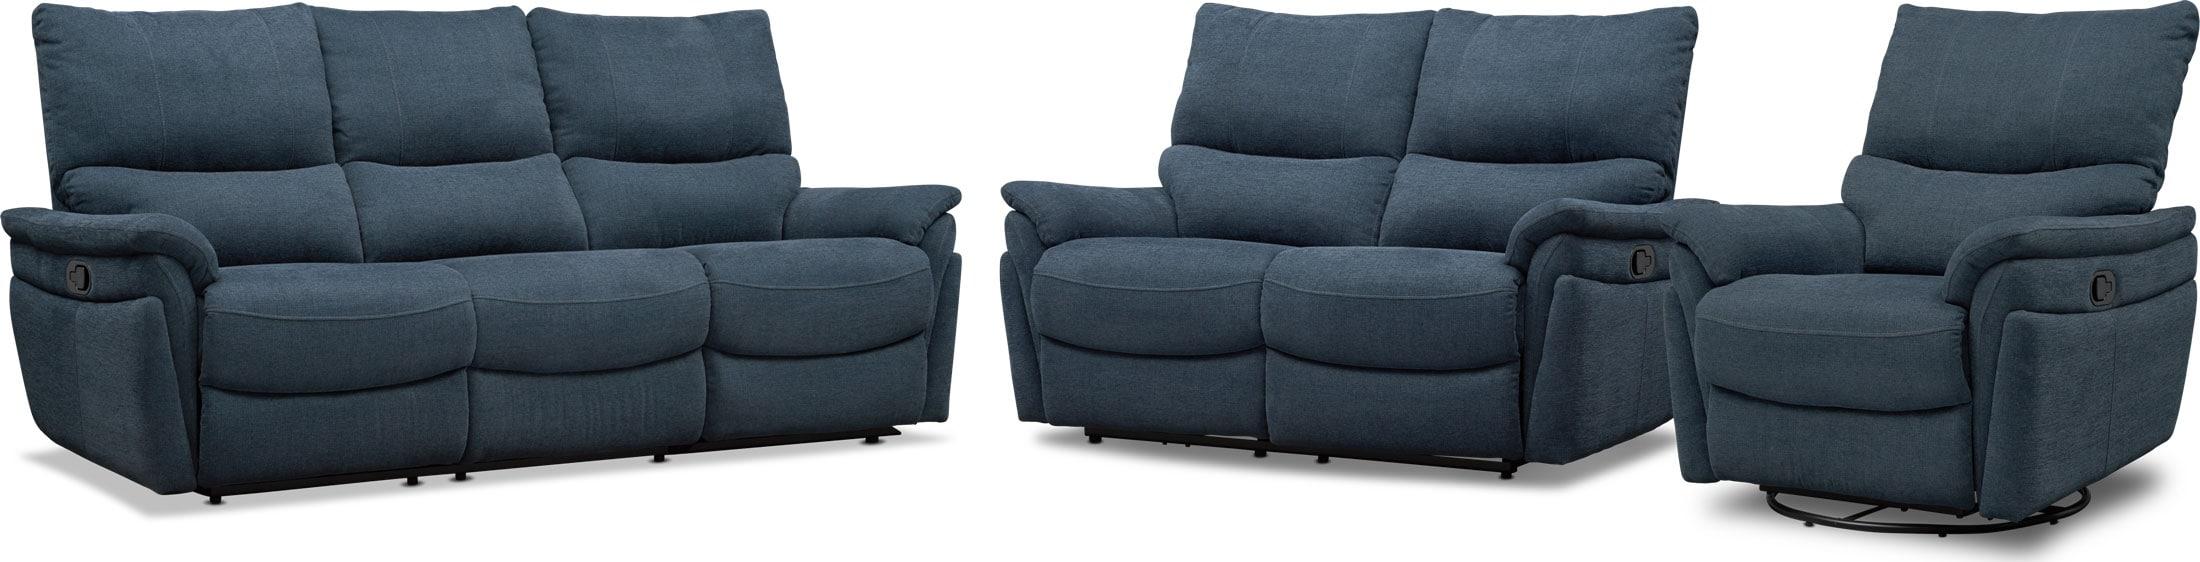 Living Room Furniture - Maddox Manual Reclining Sofa, Loveseat and Swivel Recliner